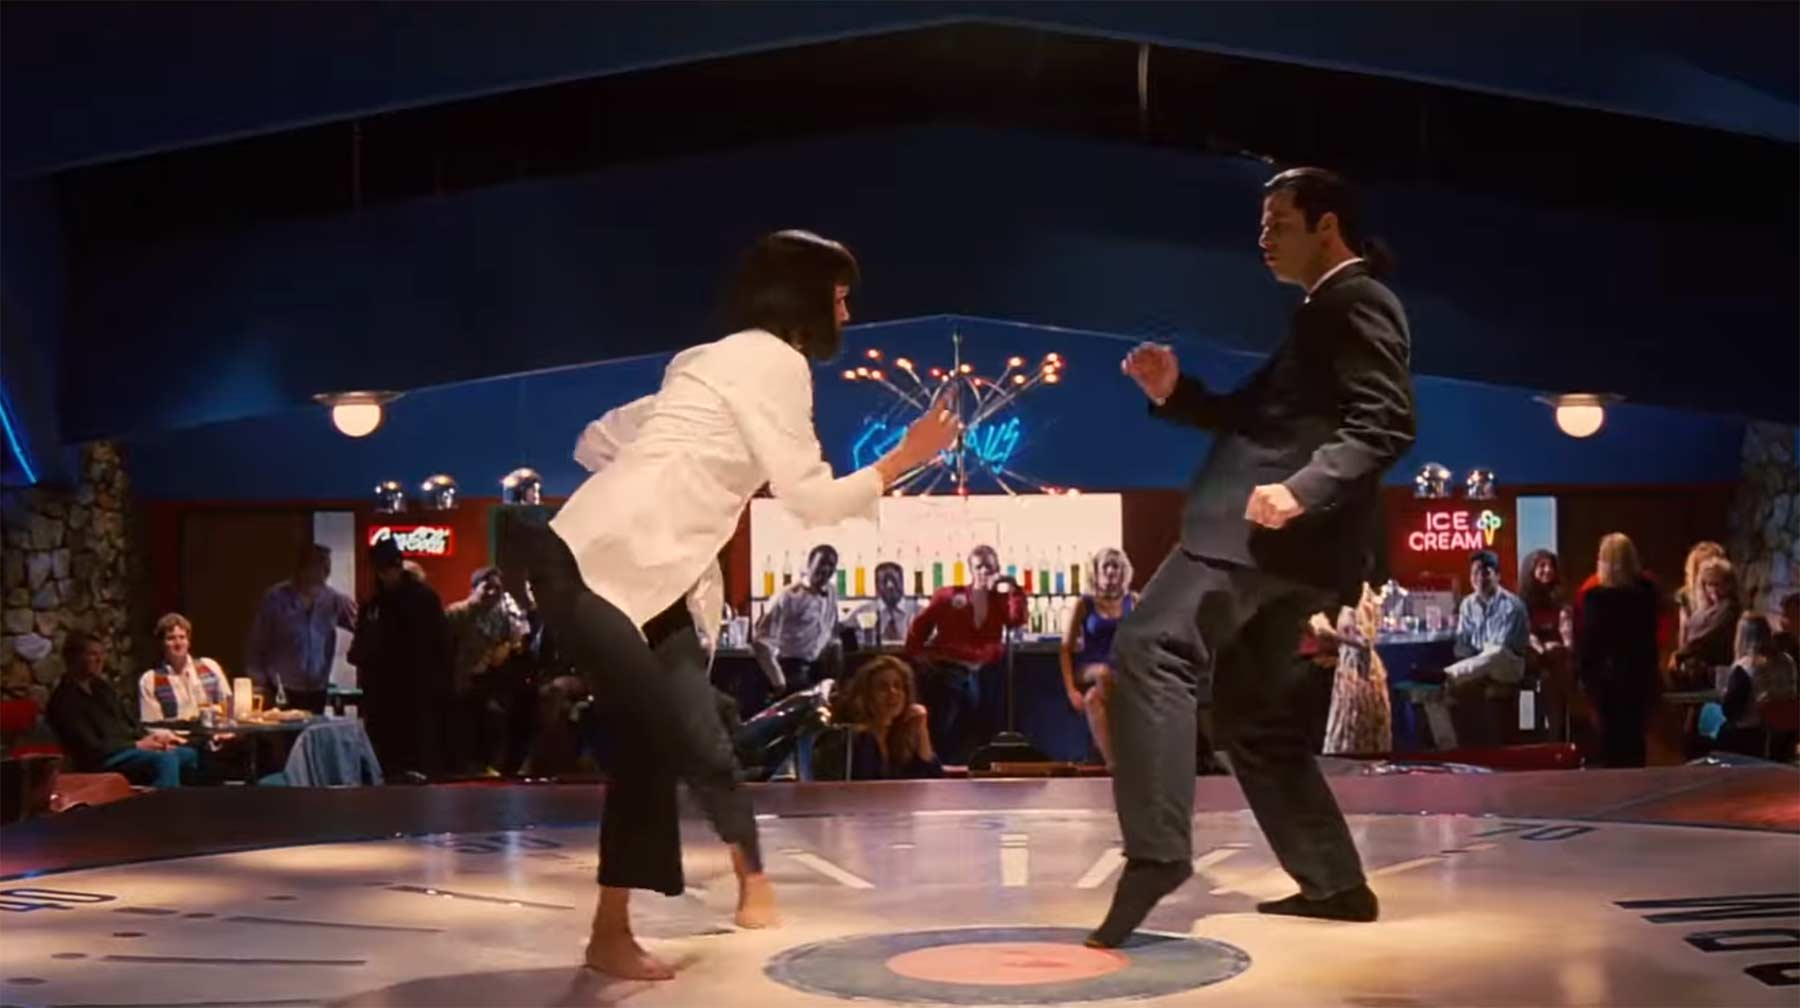 So gut klaut Quentin Tarantino Szenen aus anderen Filmen